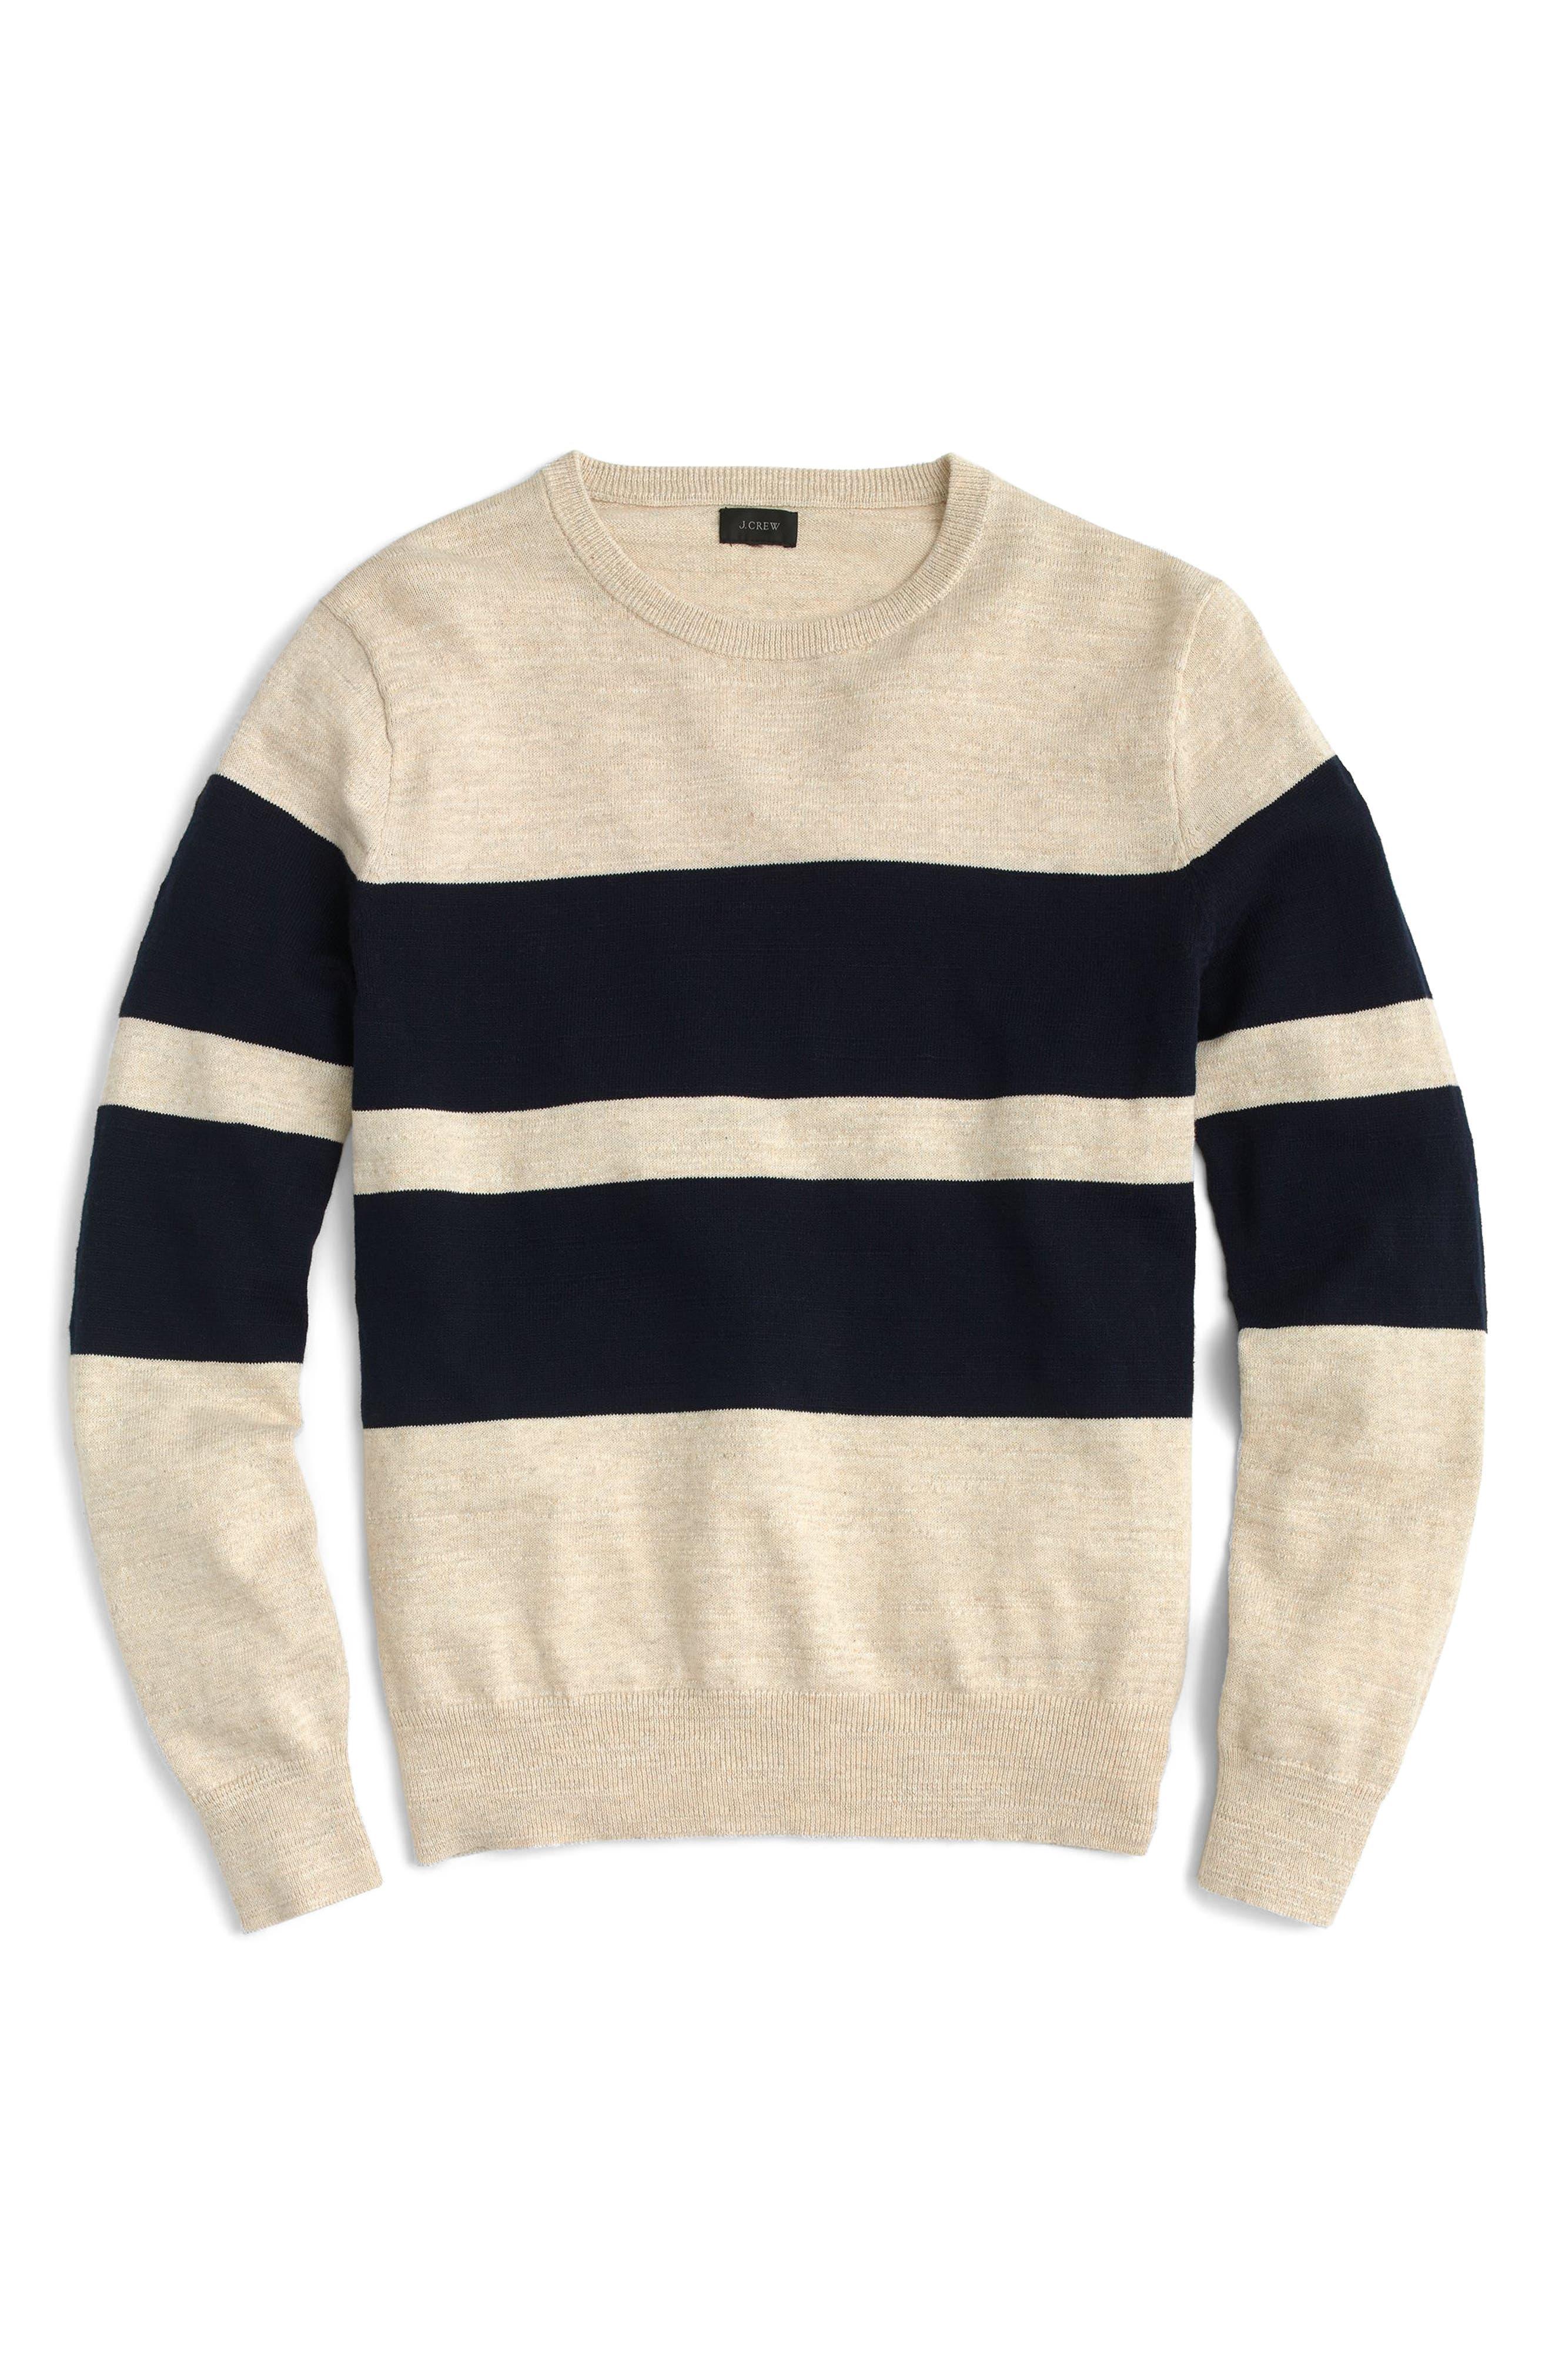 J.Crew Slim Fit Uneven Budding Stripe Sweater,                         Main,                         color, Navy